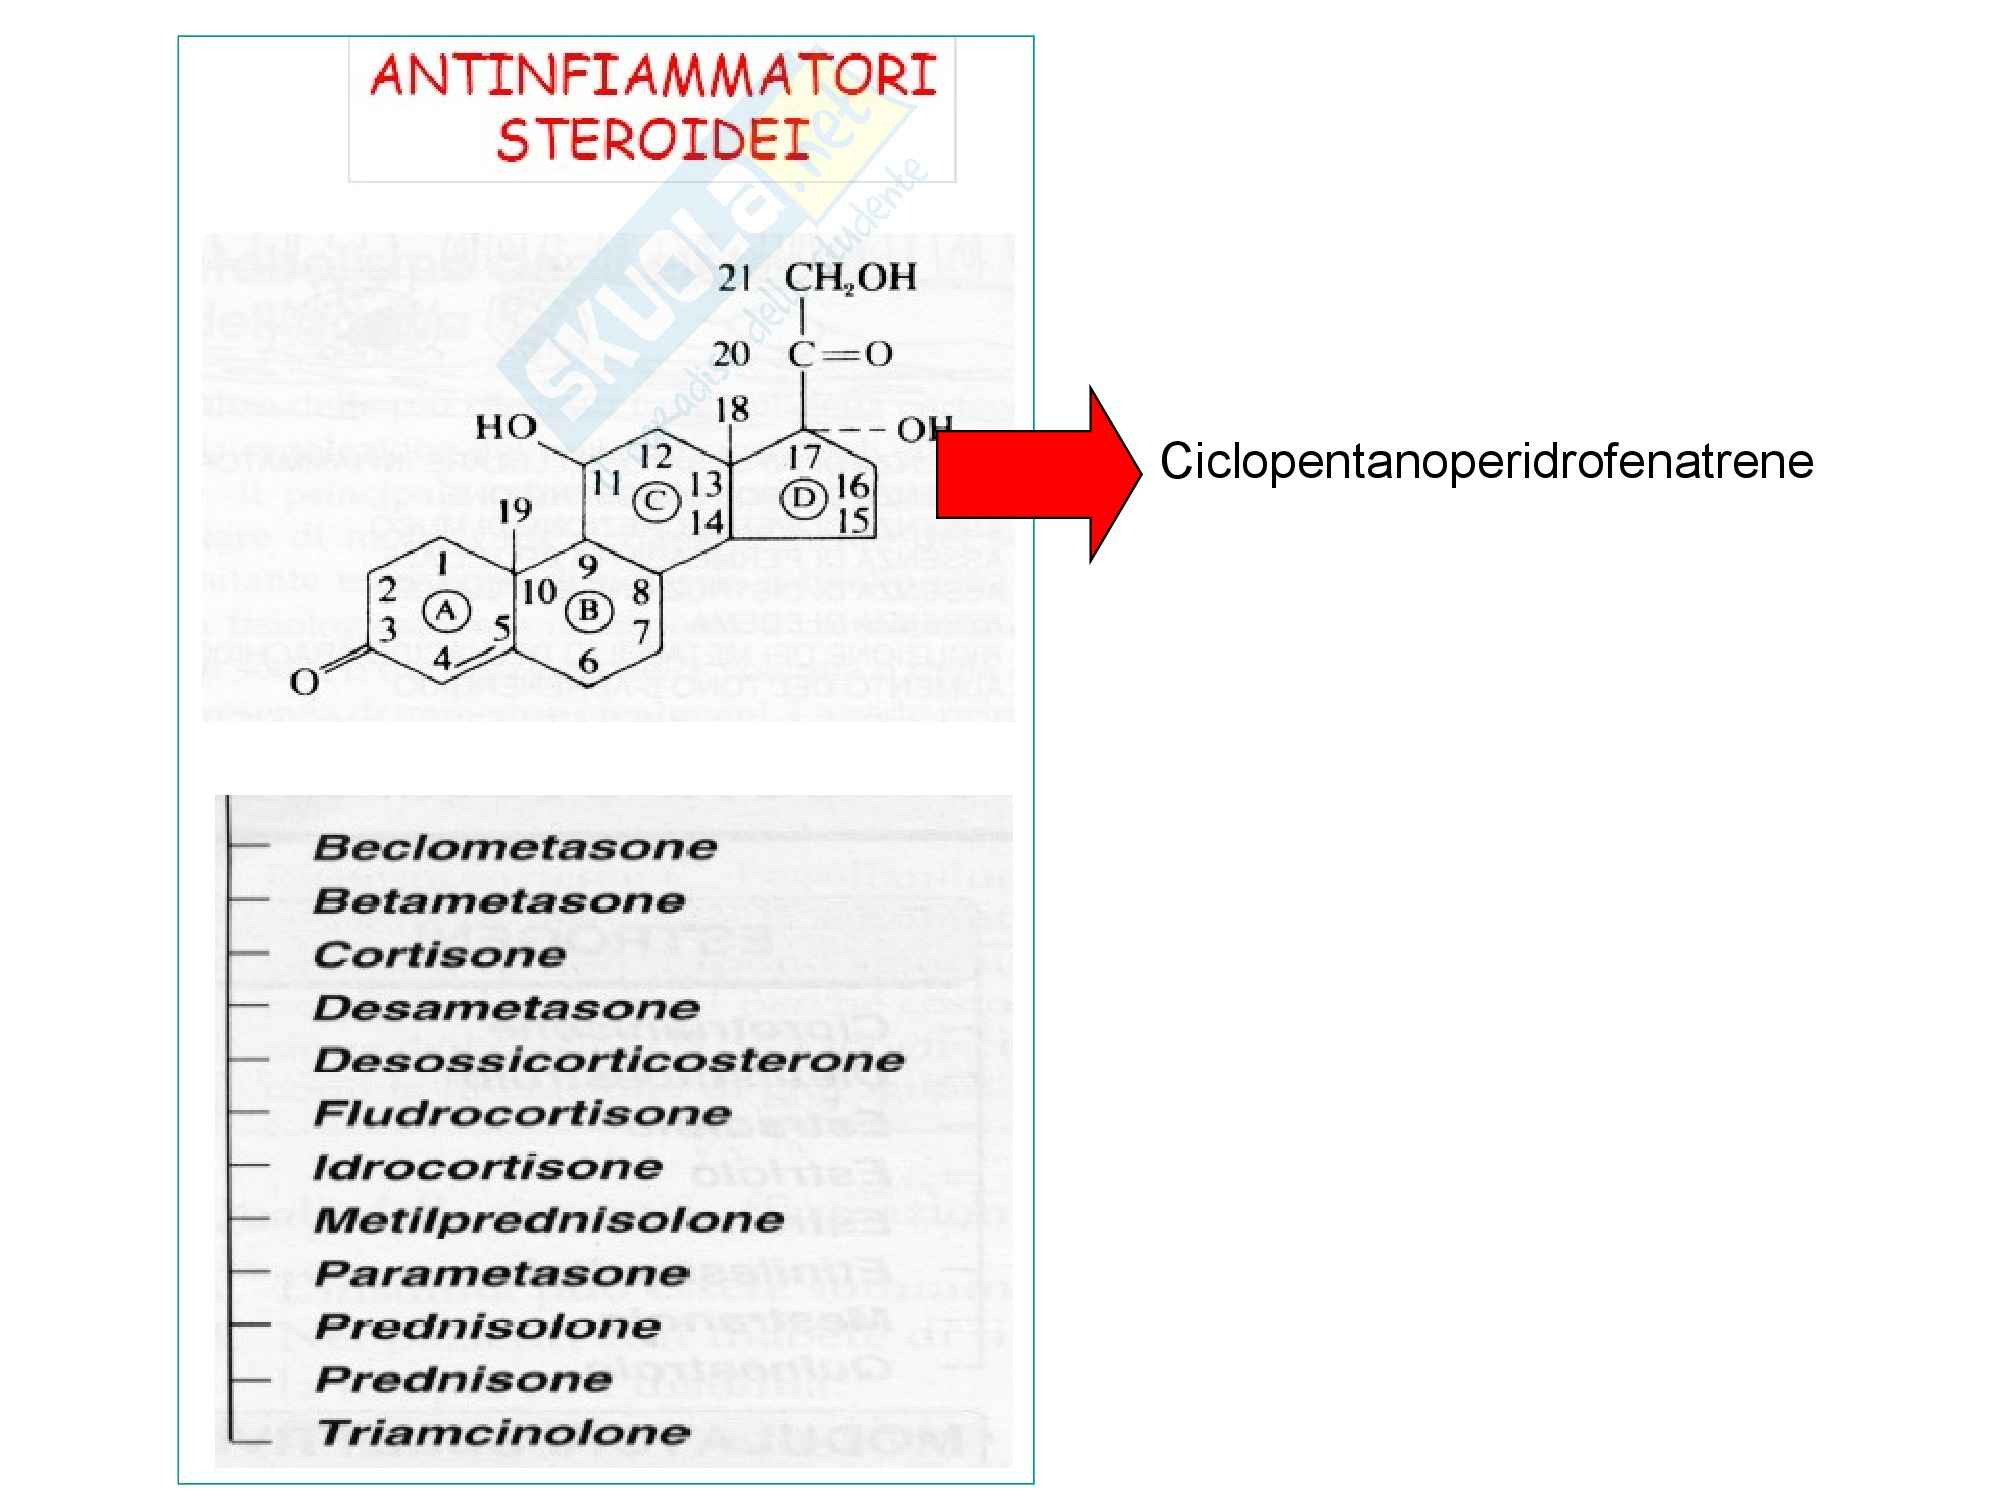 Antinfiammatori steroidei